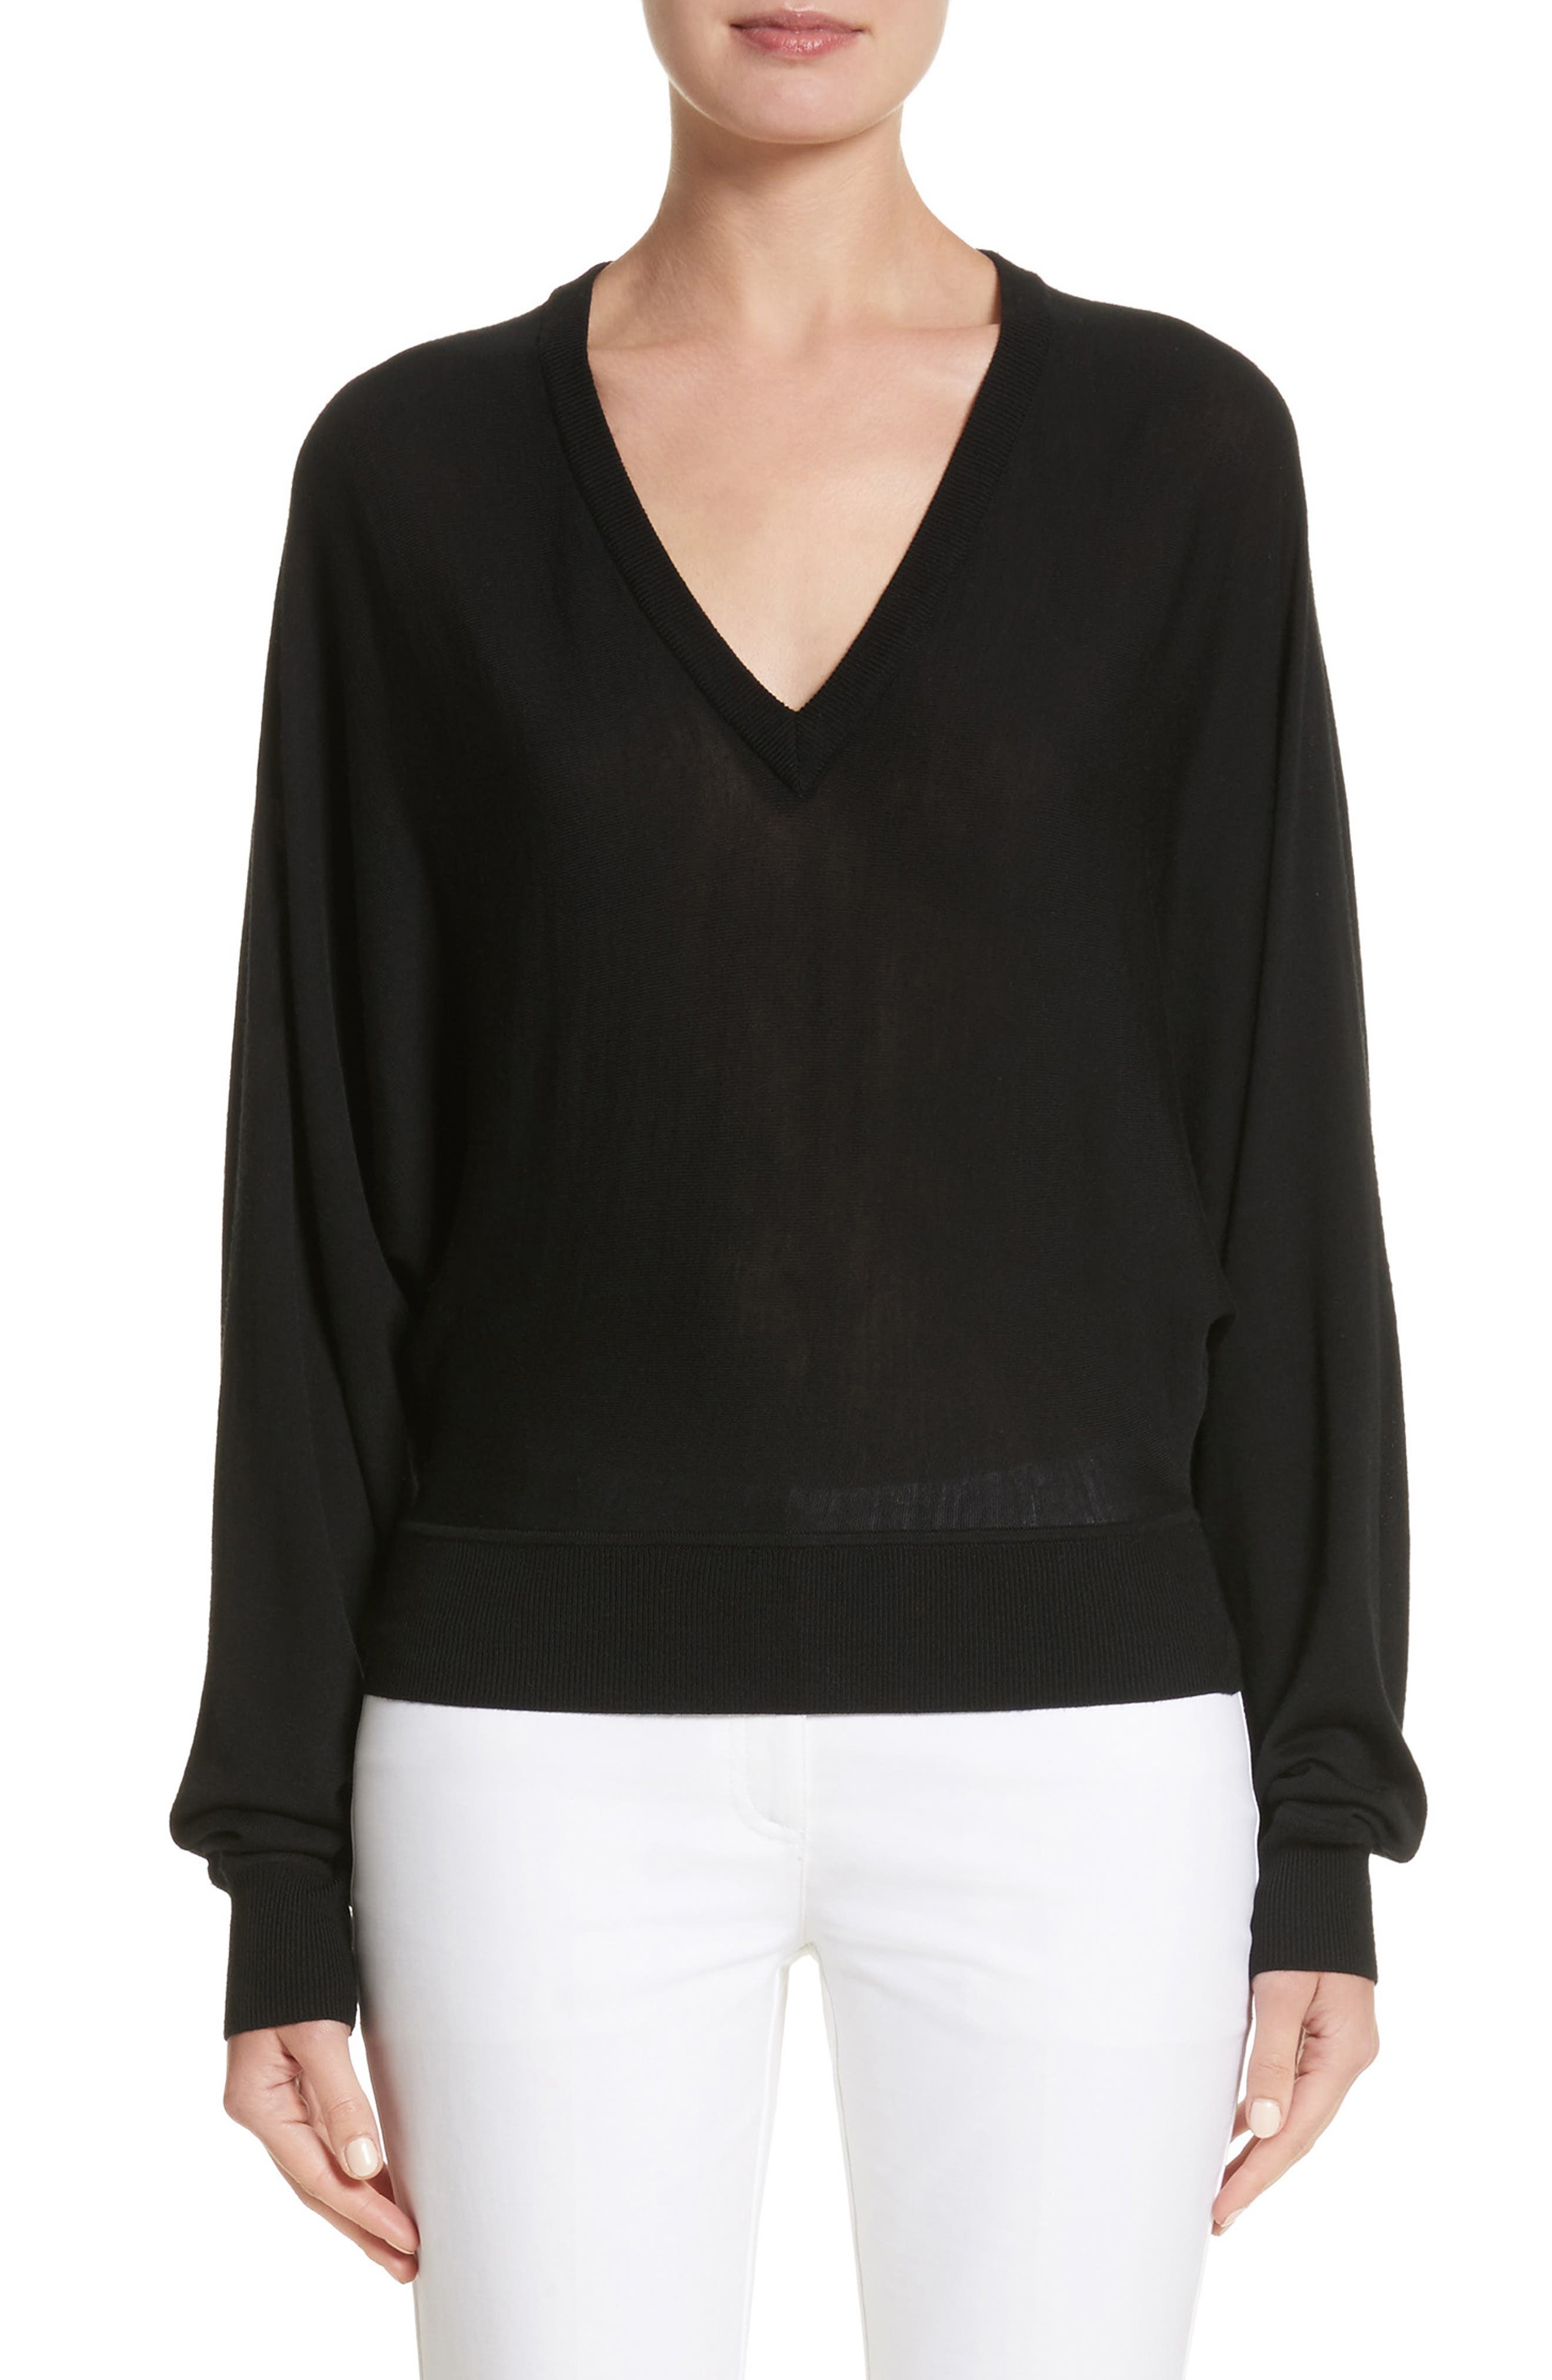 Main Image - Michael Kors Merino Wool Blend Dolman Sweater